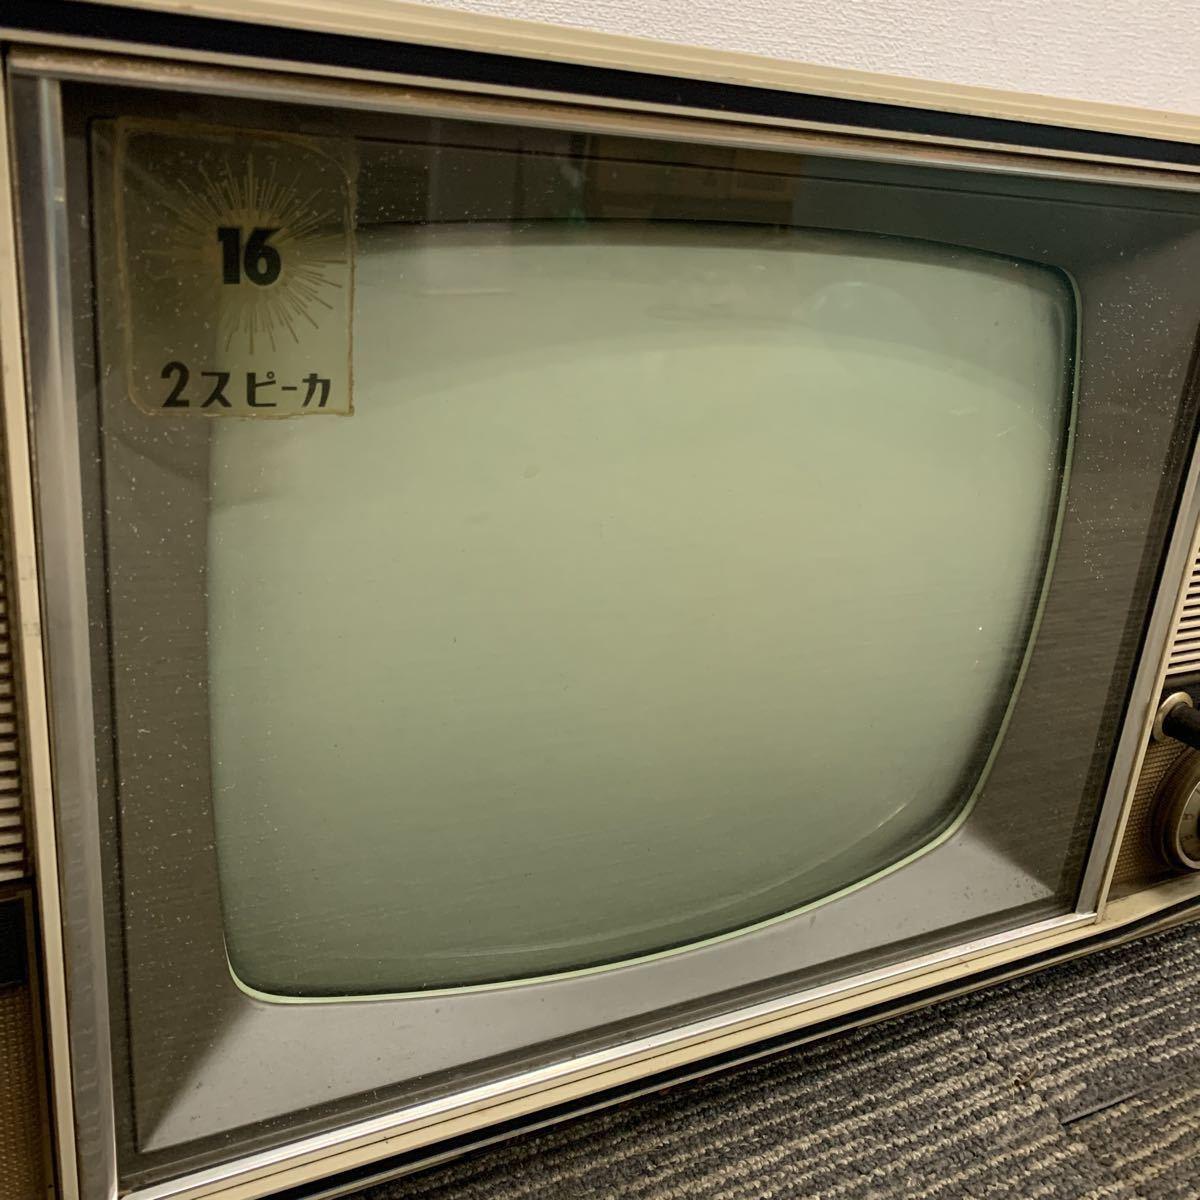 MITSUBISHI 16T-240 真空管テレビ ブラウン管テレビ アンティーク 昭和レトロ 格安売り切りスタート◎_画像5